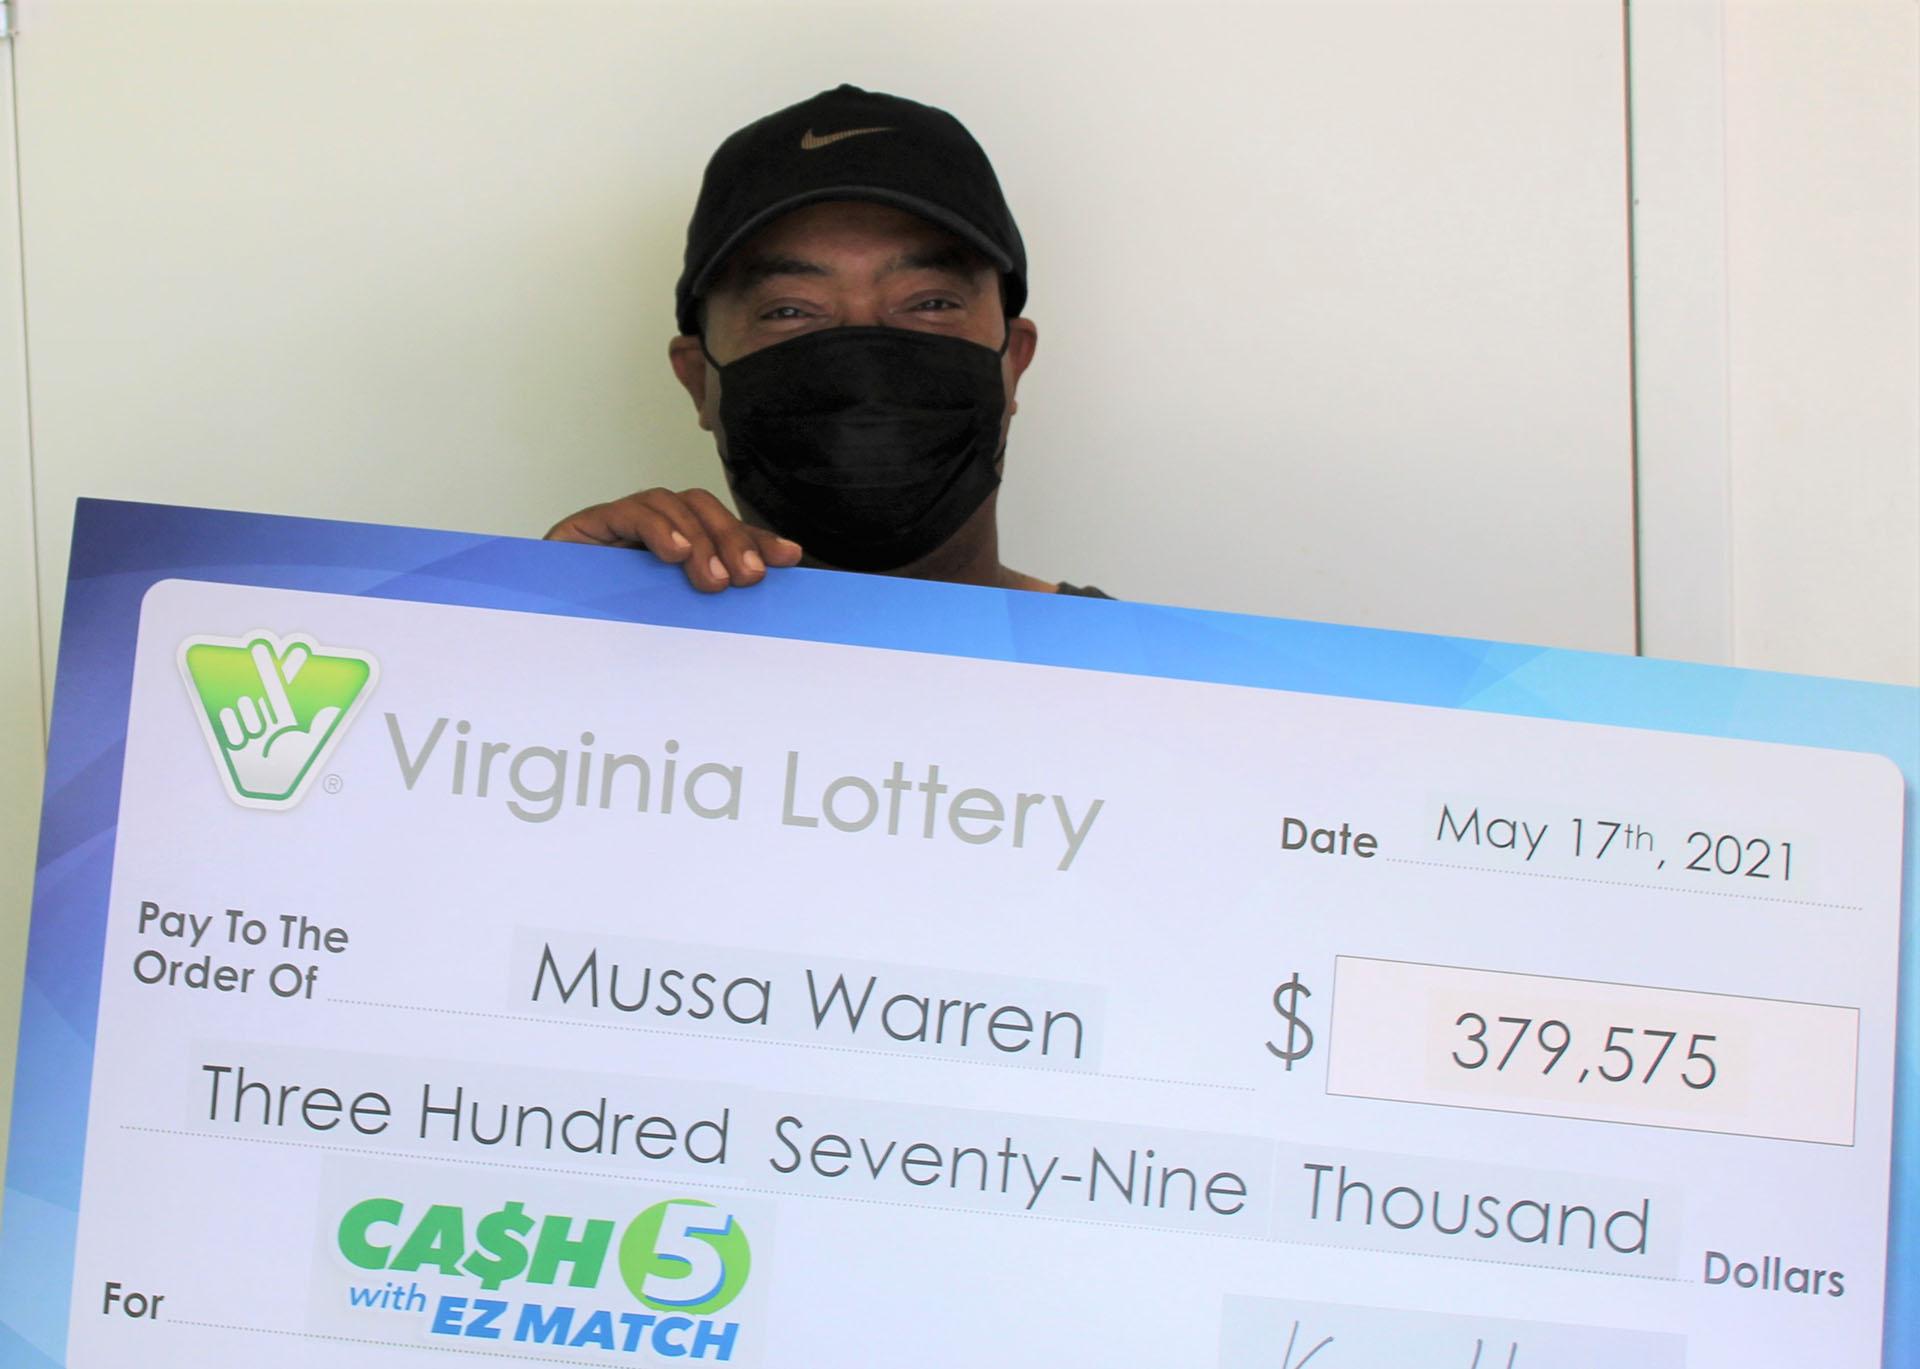 Virginia Lottery won by Woodbridge resident